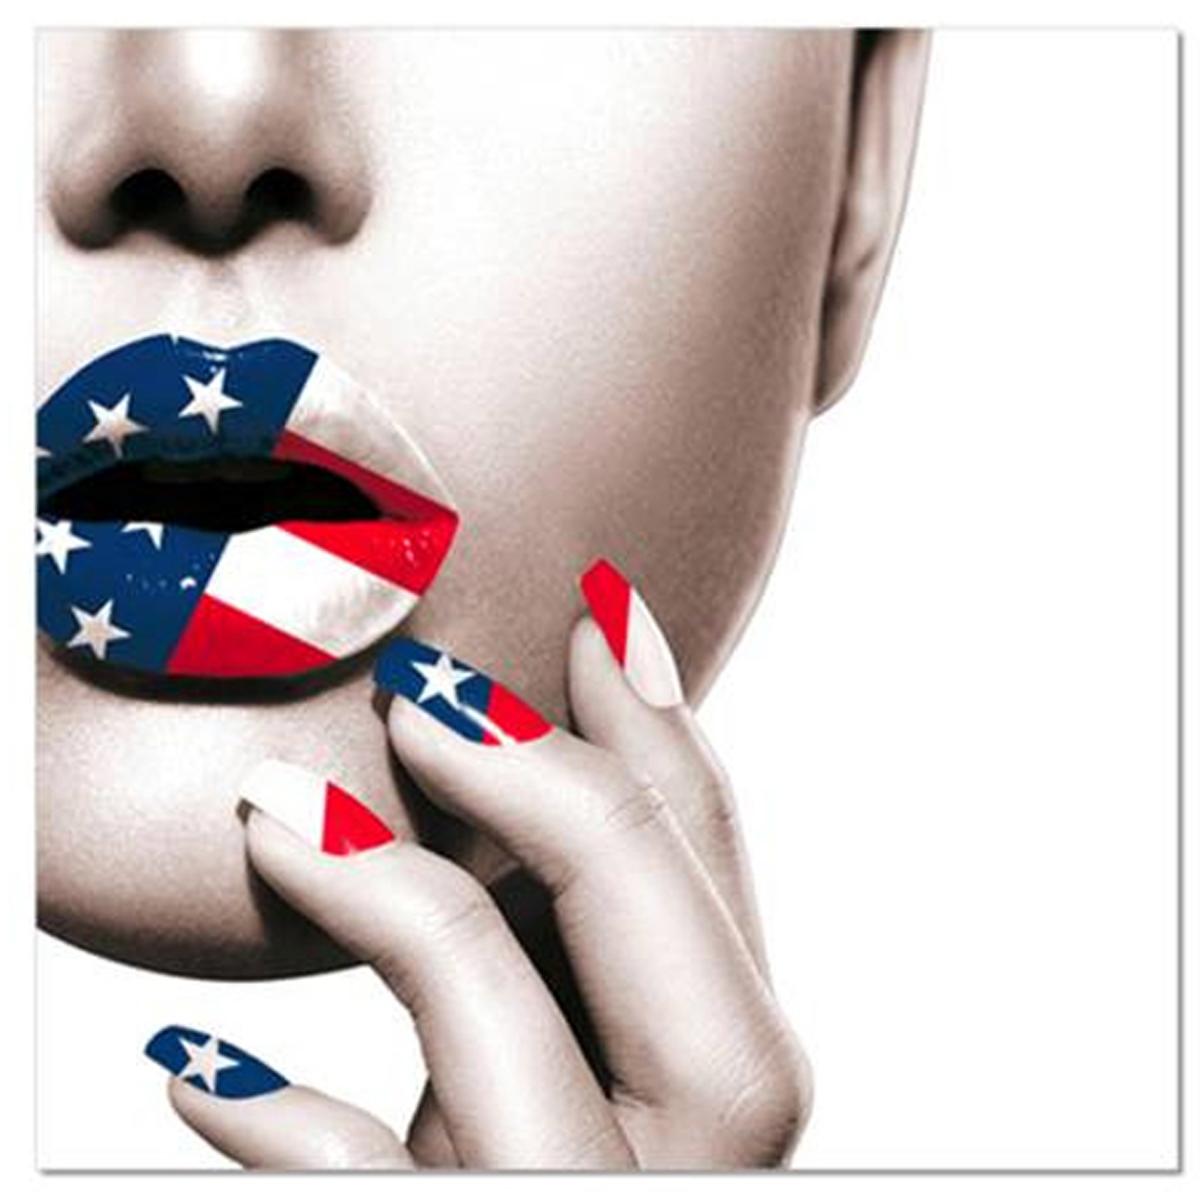 Toile \'America\' make up (rouge à lèvres, vernis) - 40x40 cm - [R2613]